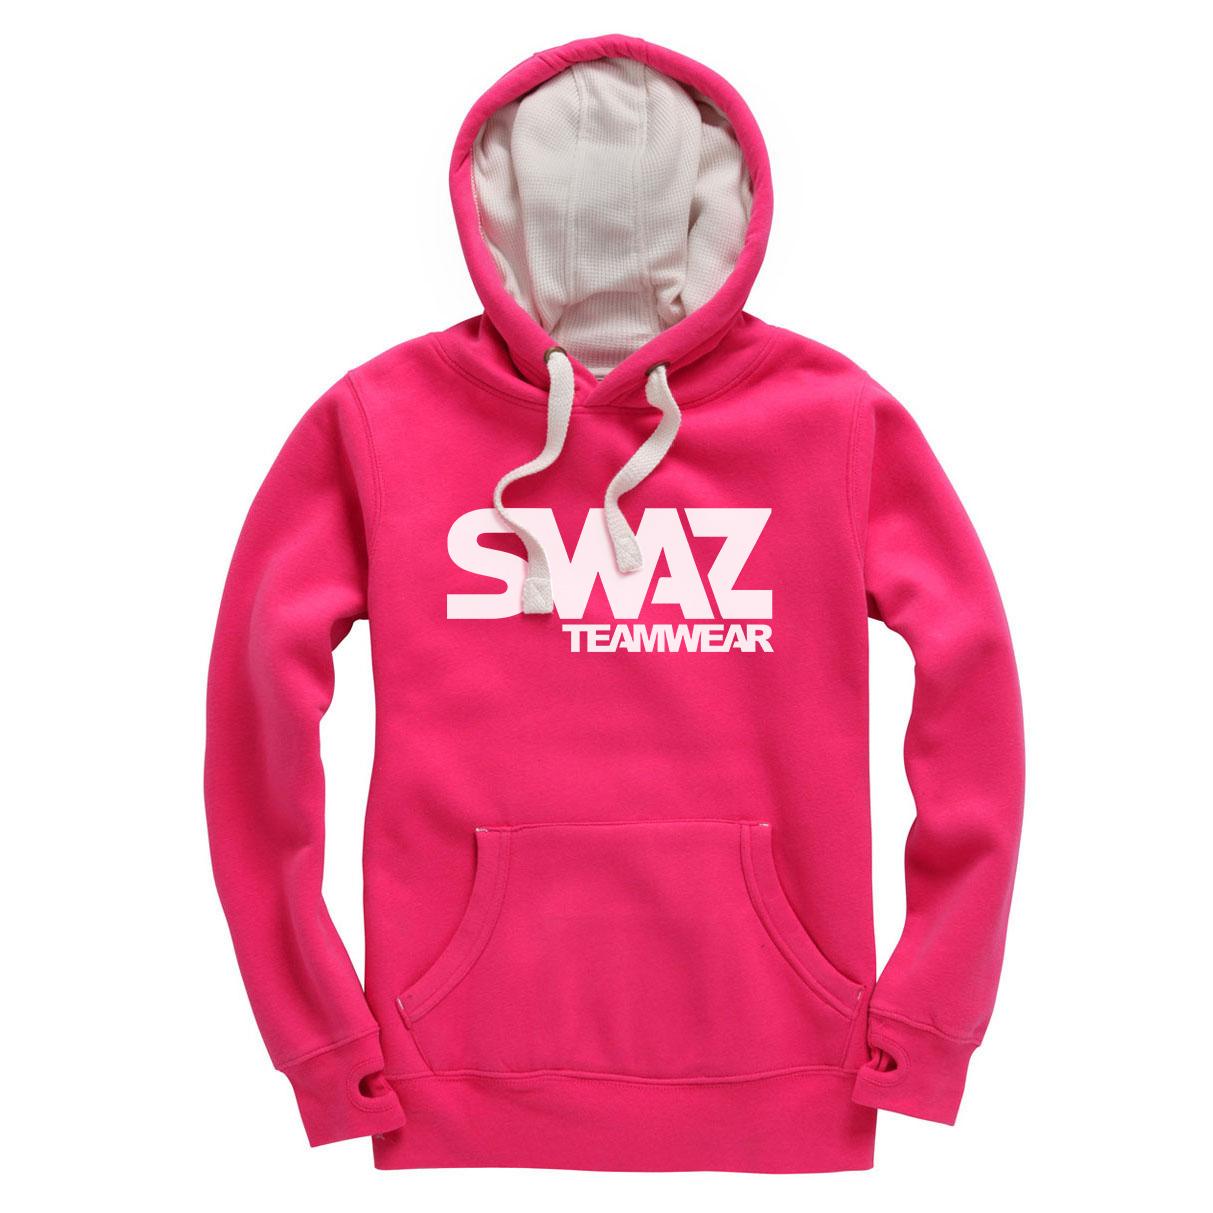 SWAZ Teamwear Classic Hoody – Cerise